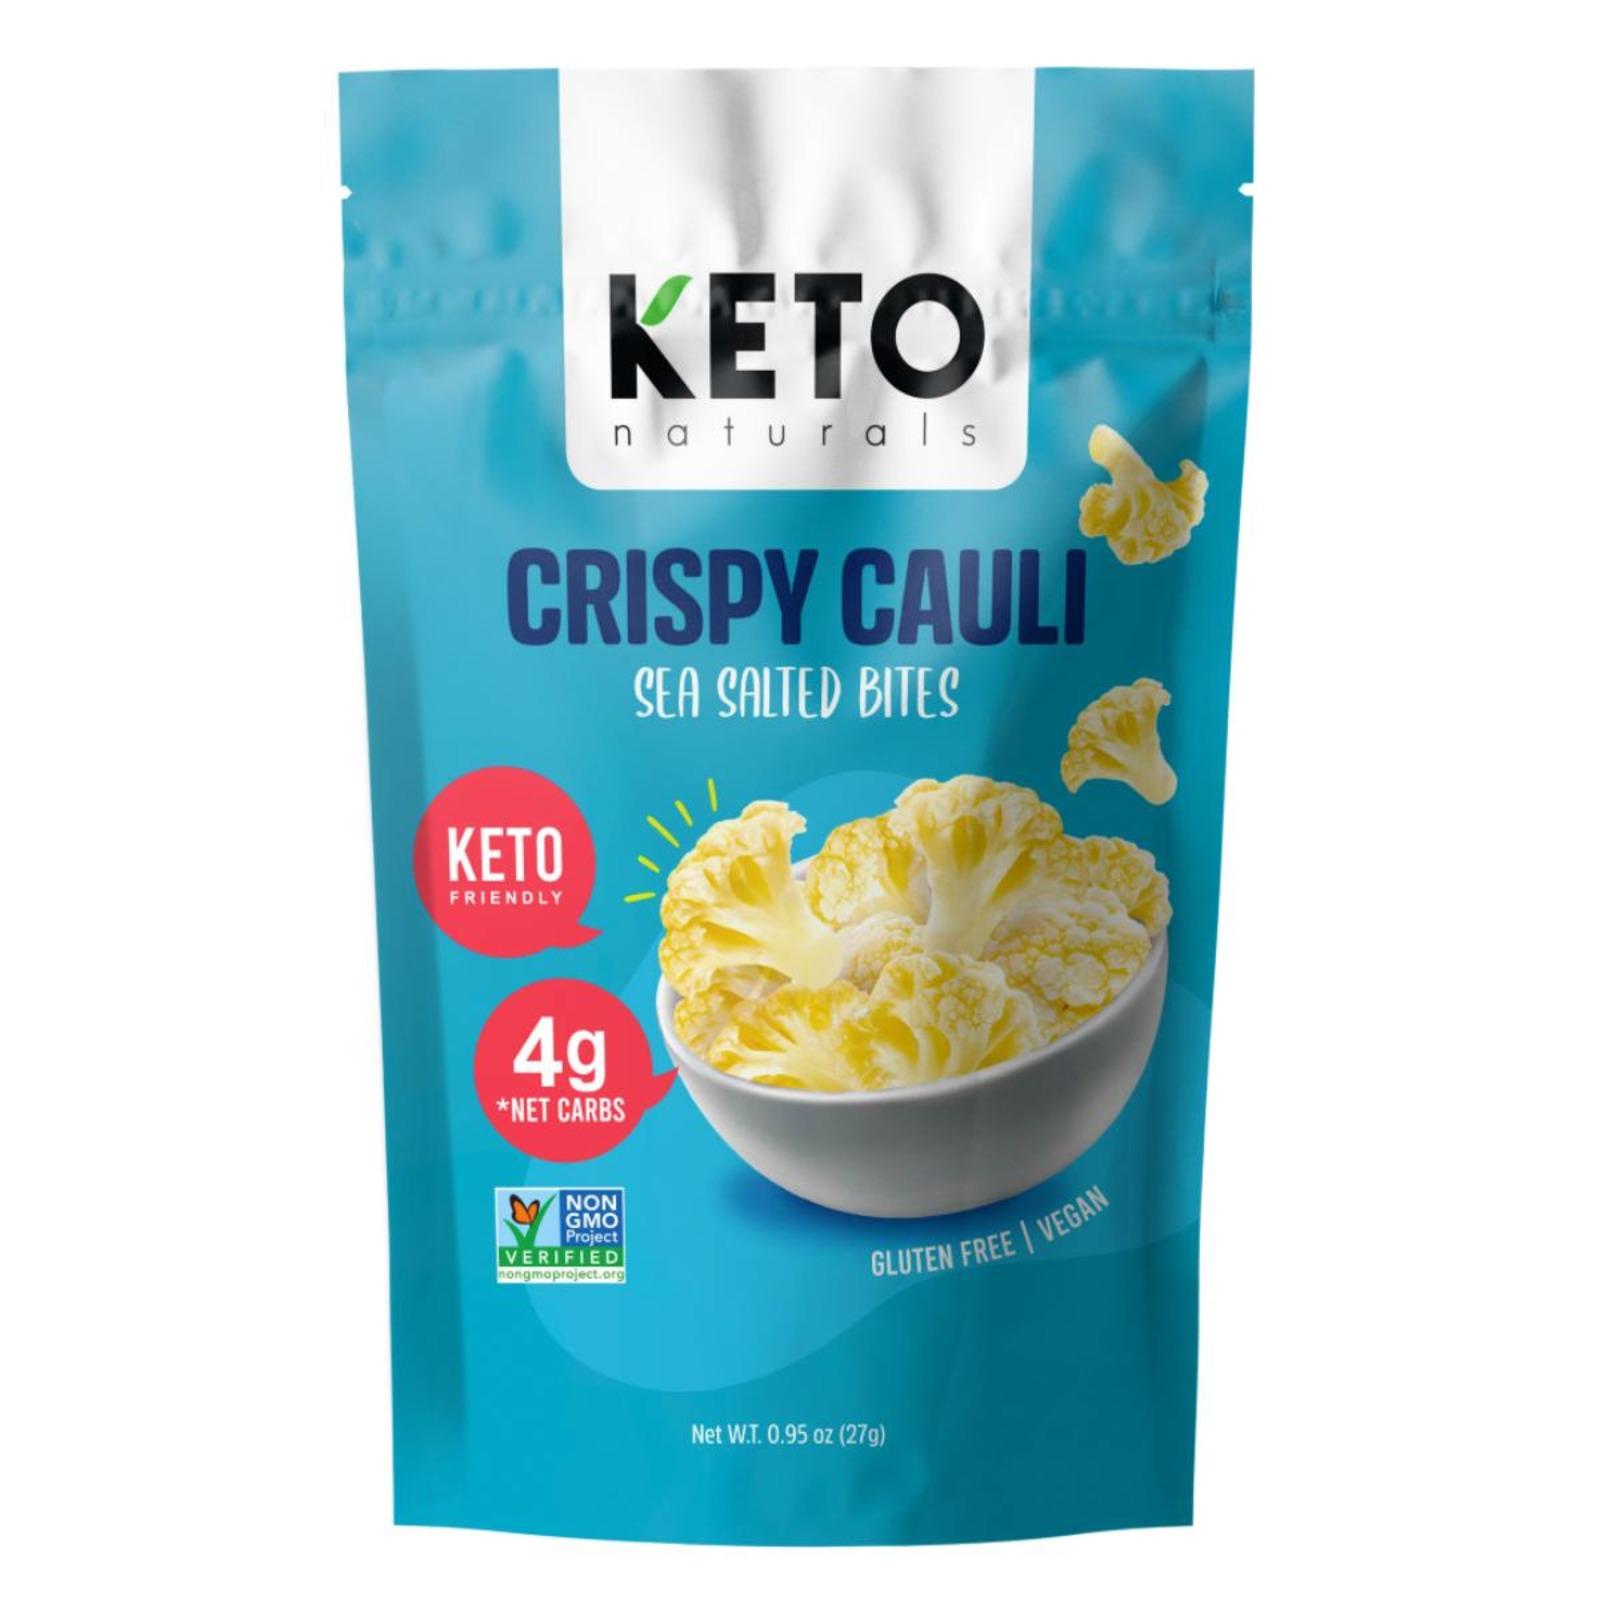 Keto Naturals Crispy Cauliflower - Sea Salted Bites